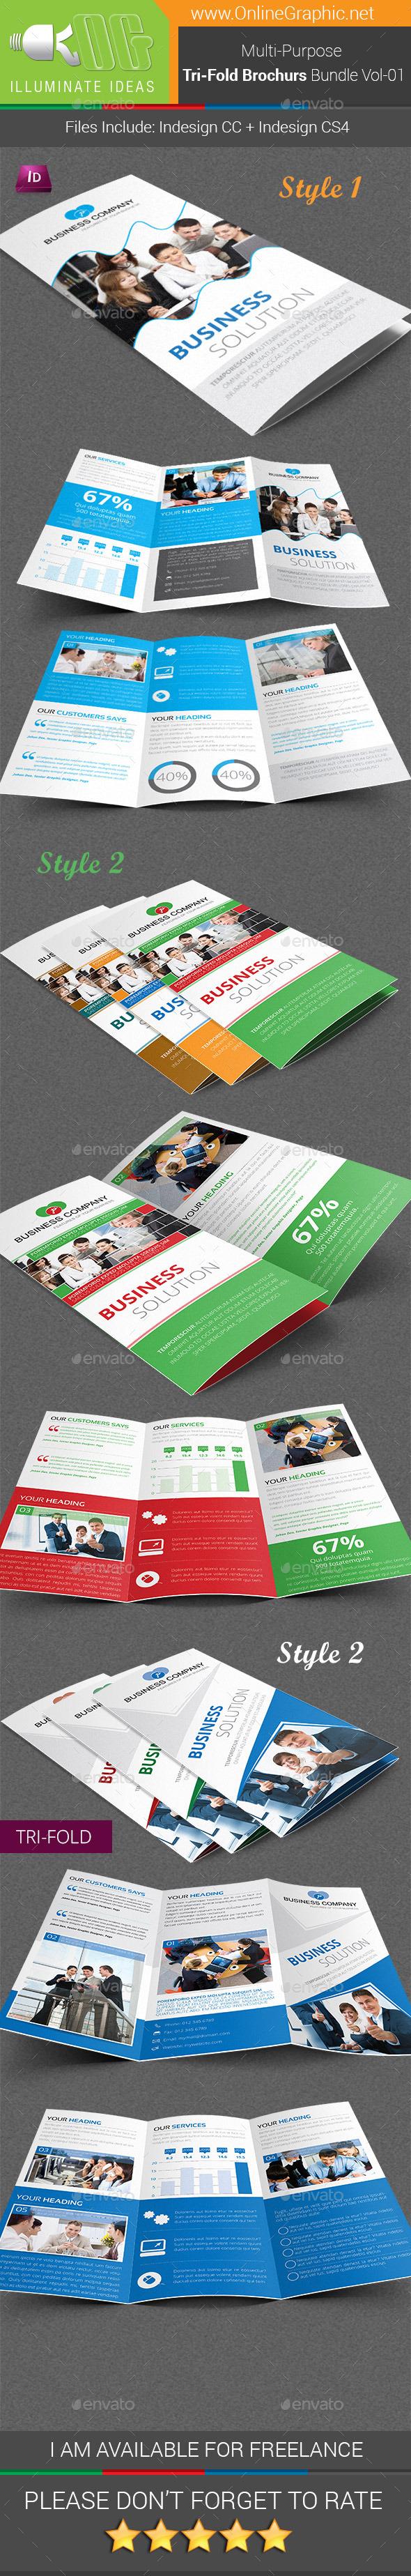 Multipurpose Tri-Fold Brochures Bundle Vol-01 - Corporate Brochures